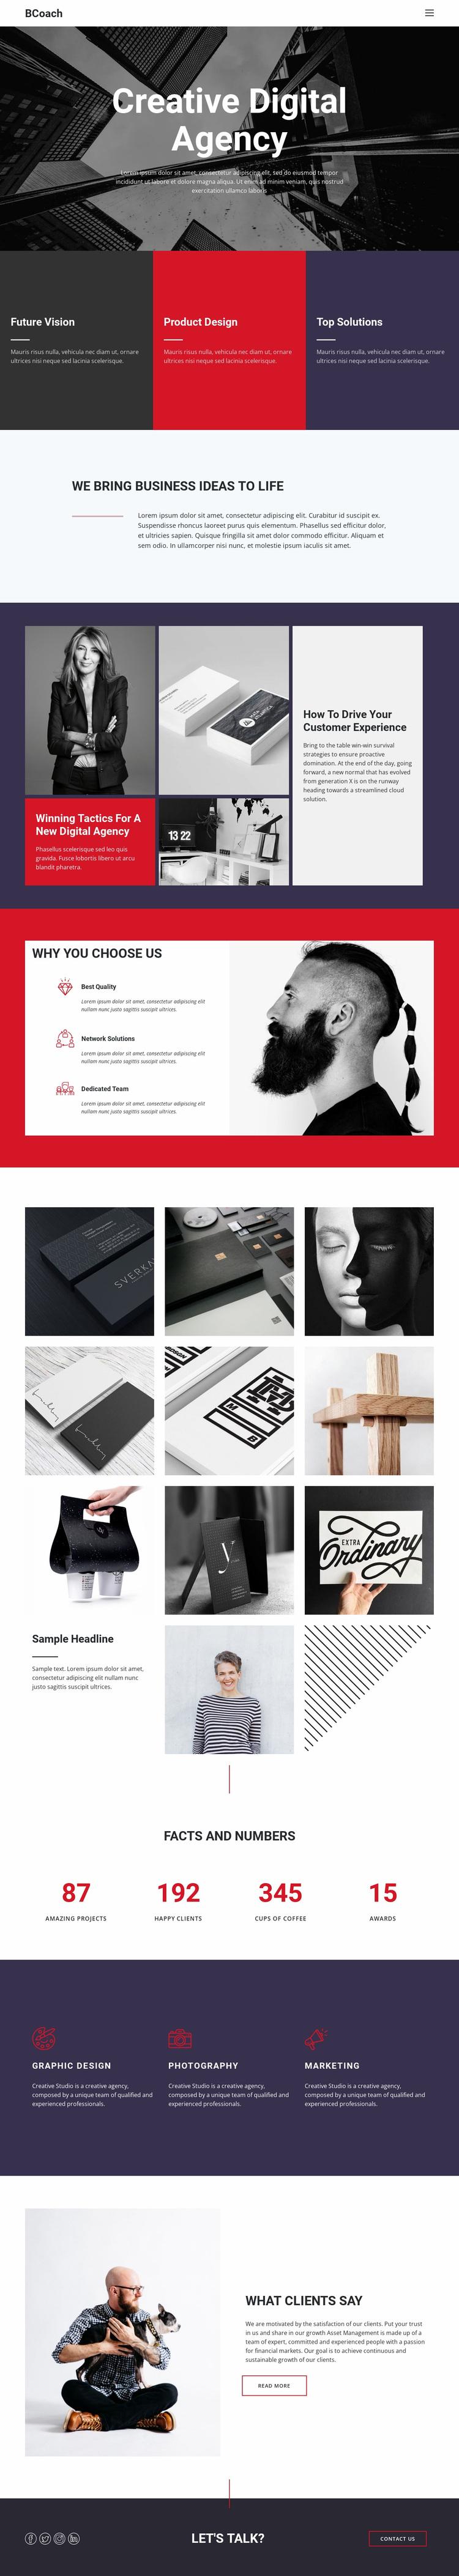 Digitize your products Website Design